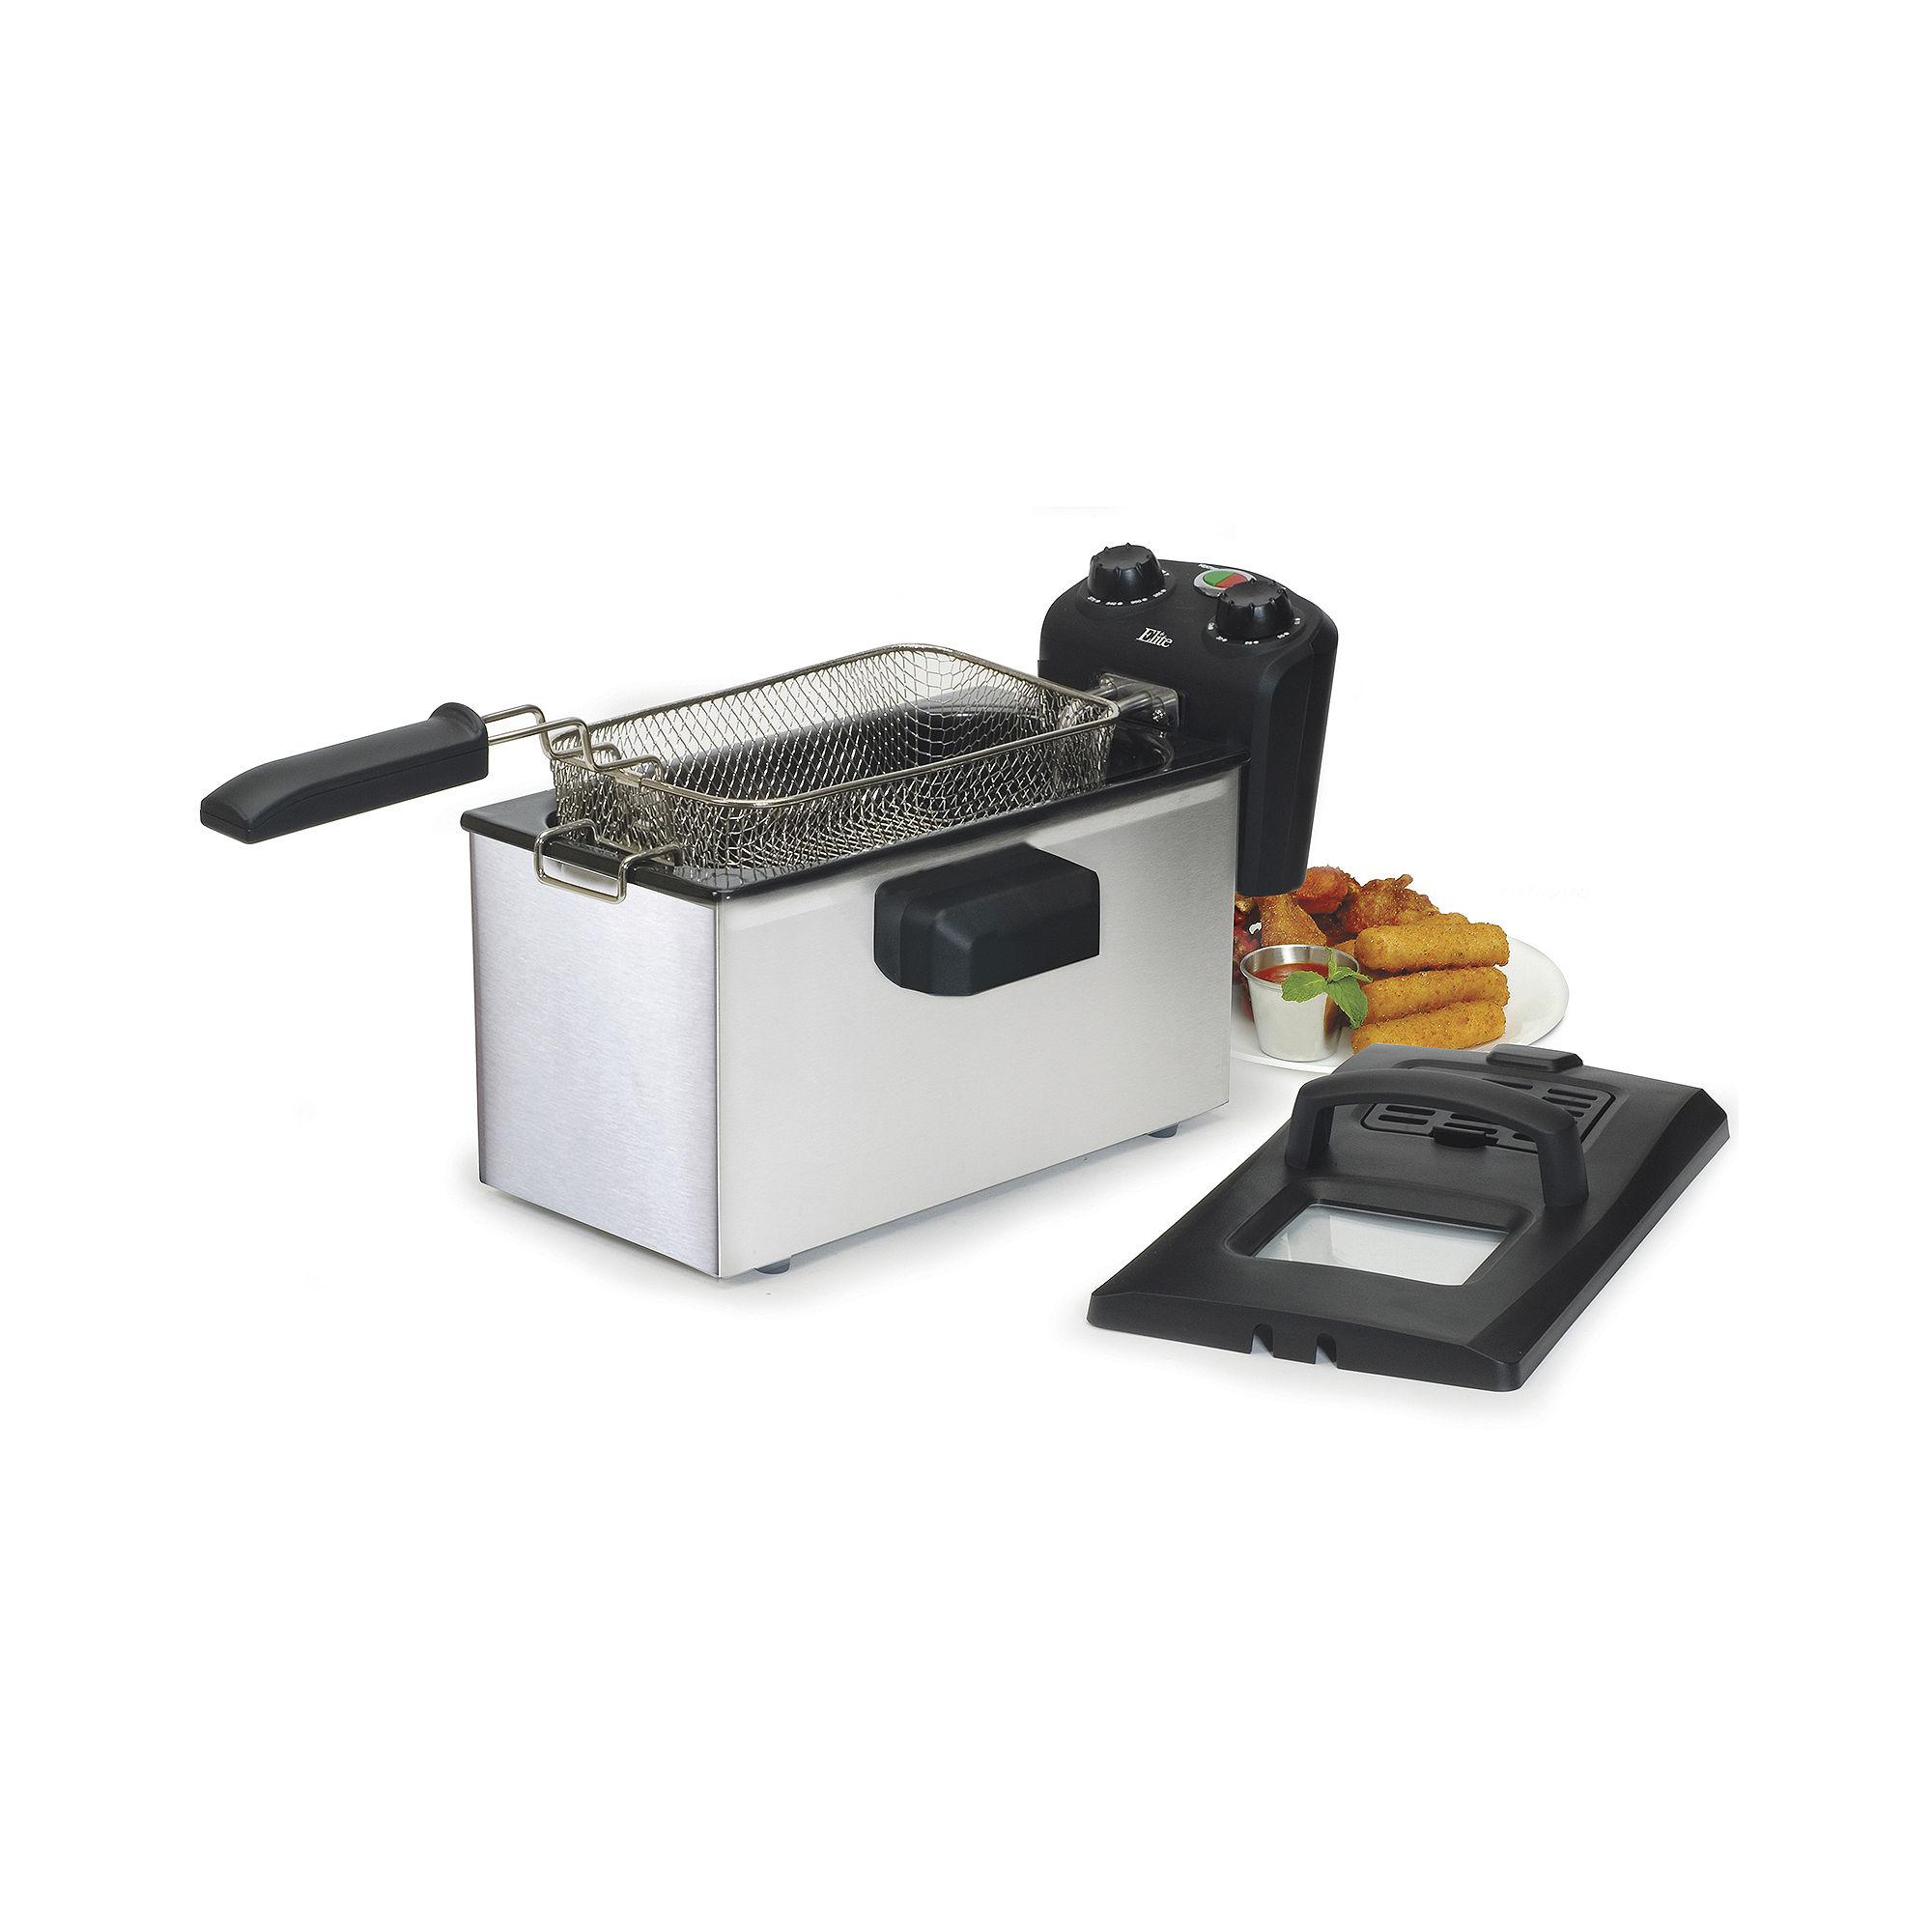 Elite Gourmet EDF-3500 3.5-Quart Immersion Deep Fryer with Timer & Thermostat